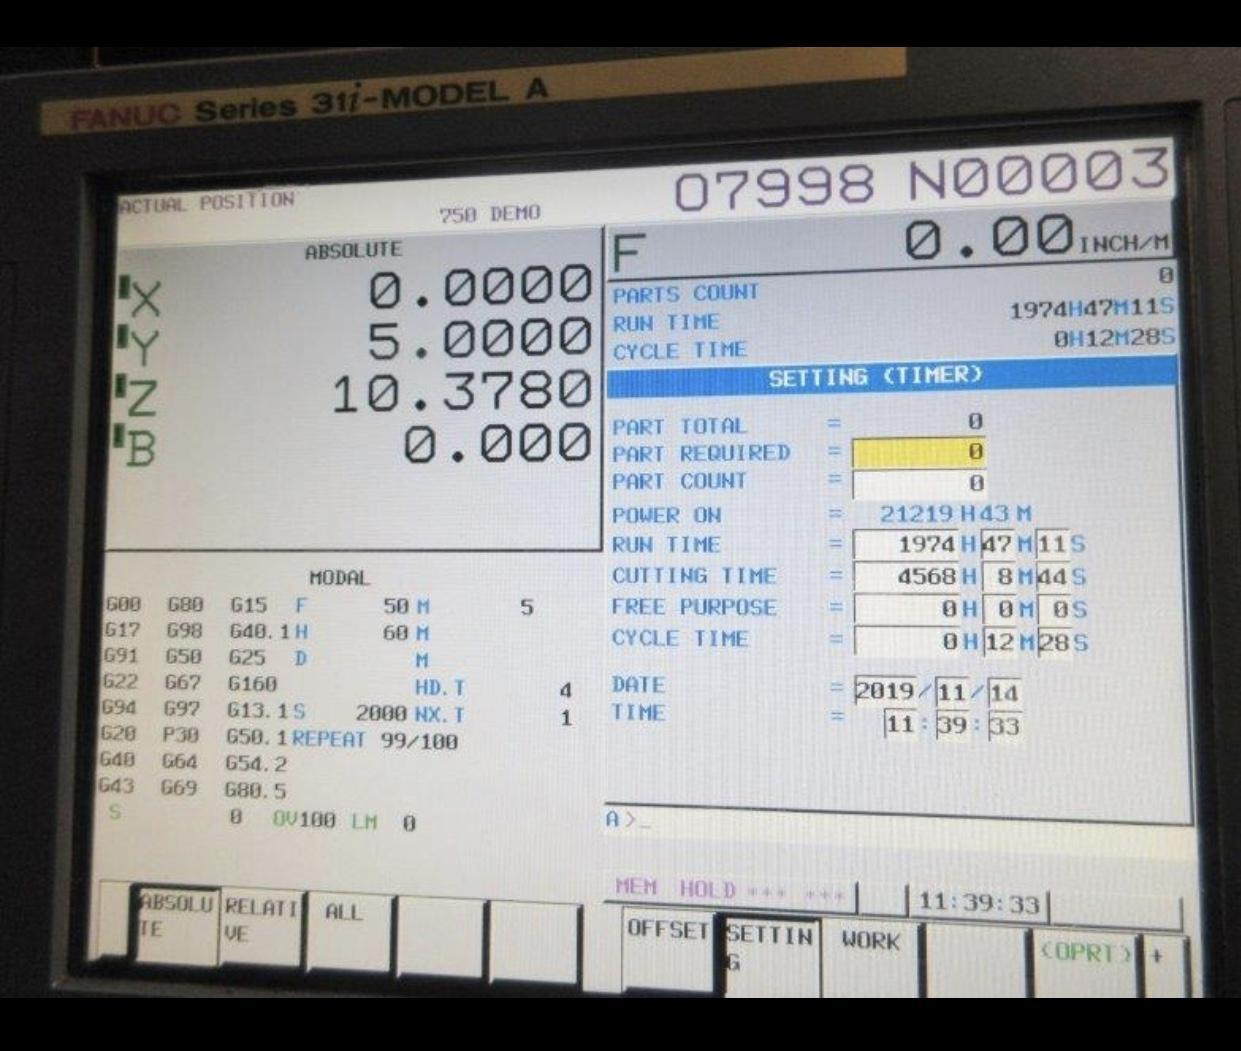 DOOSAN HM 8000 (2012)  FULL 4TH AXIS, TSC, 90 ATC,